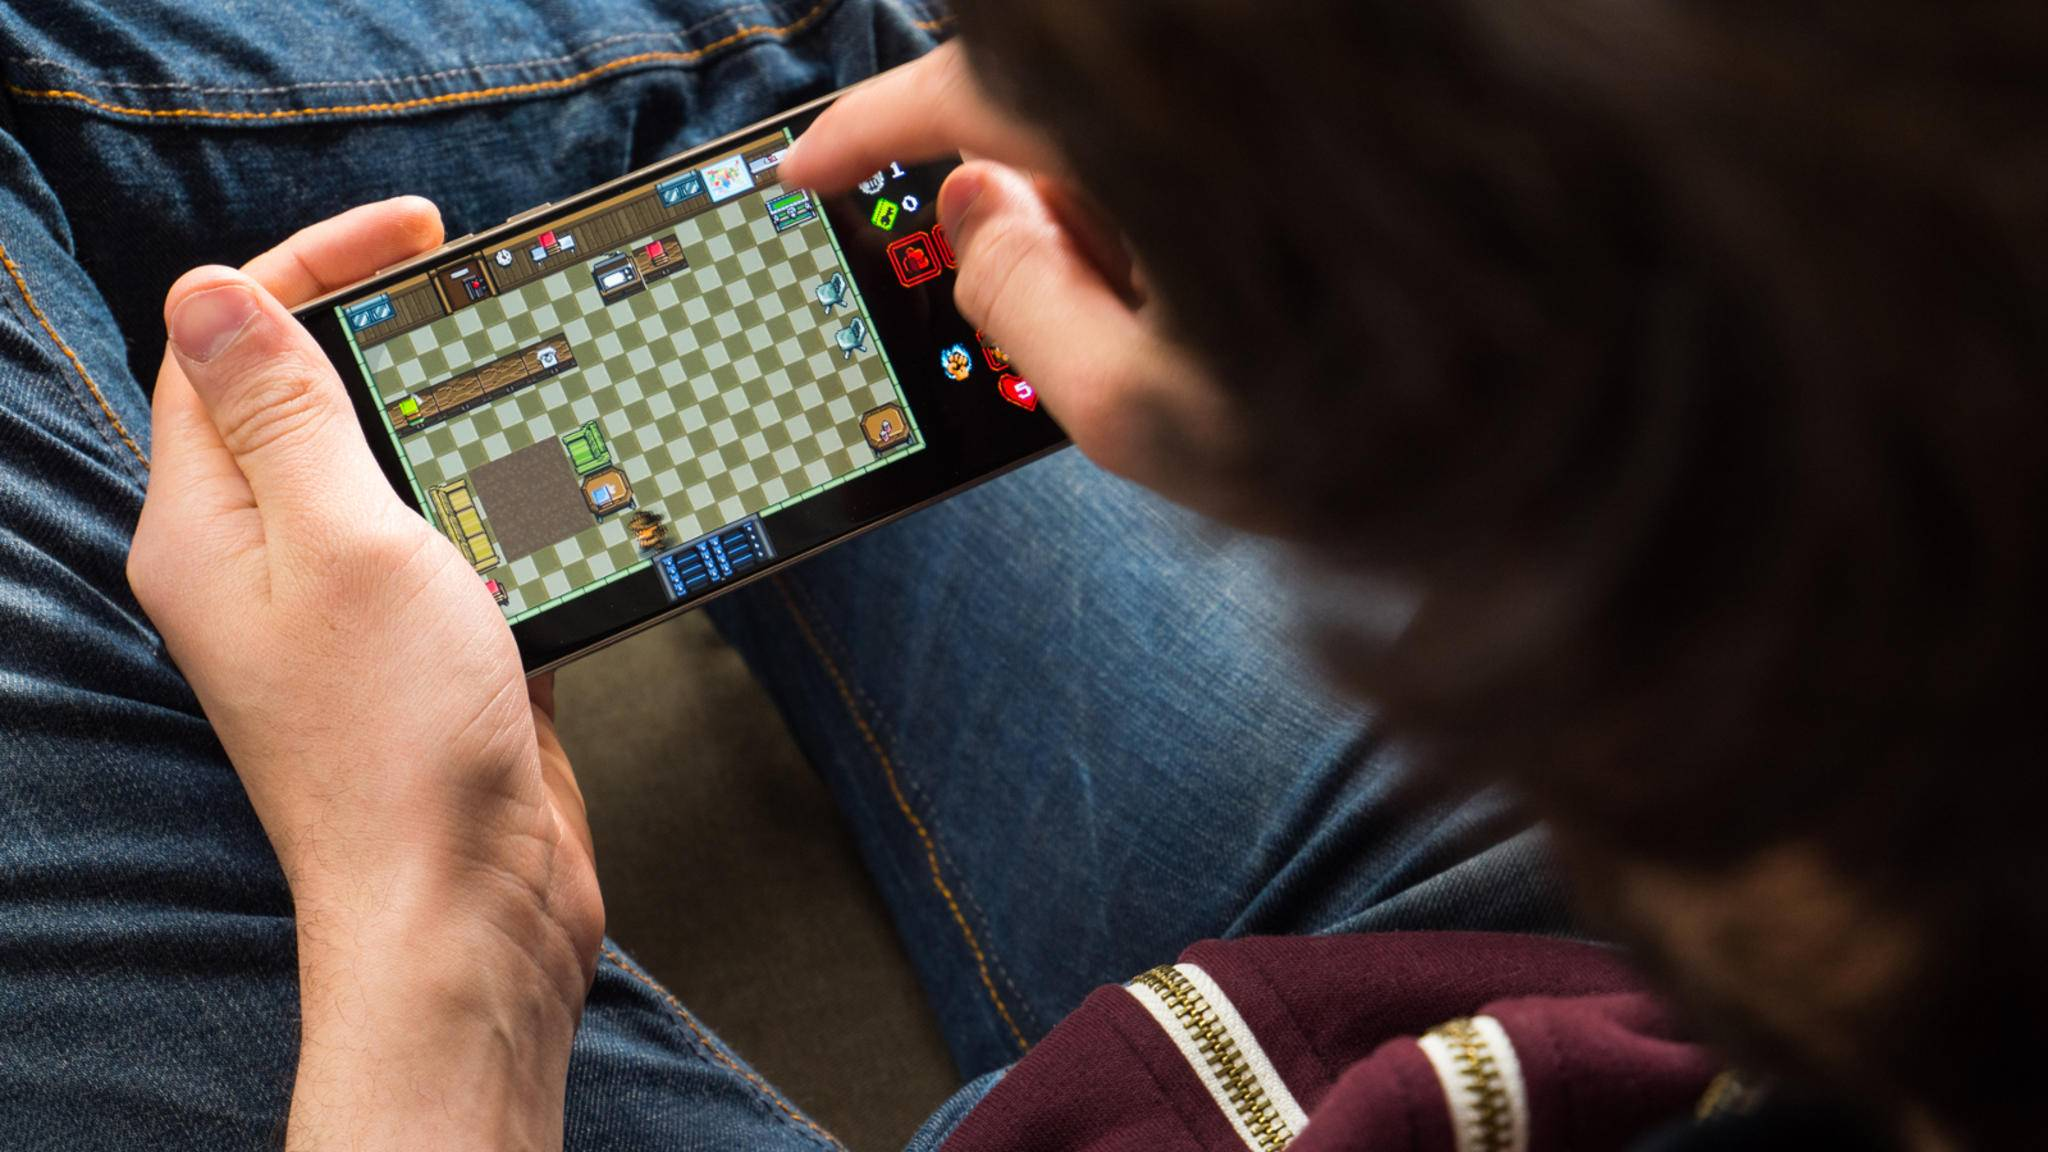 Gesteuert wird – trotz Retro-Optik – per Tippen auf dem Touchscreen.